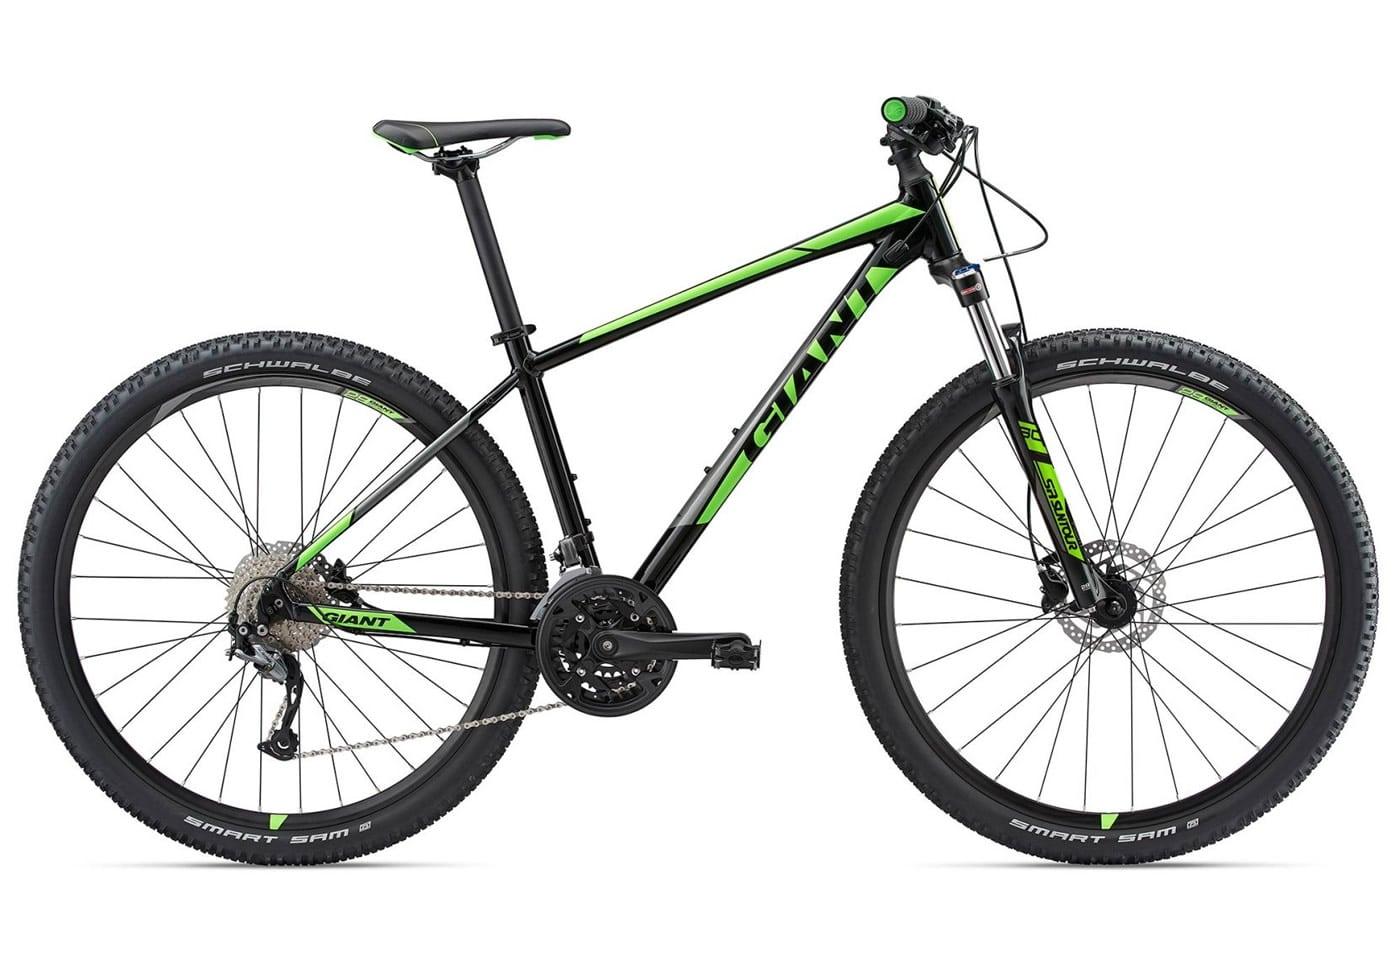 Bicicleta montaña Giant TALON 29ER 3 GE 2018